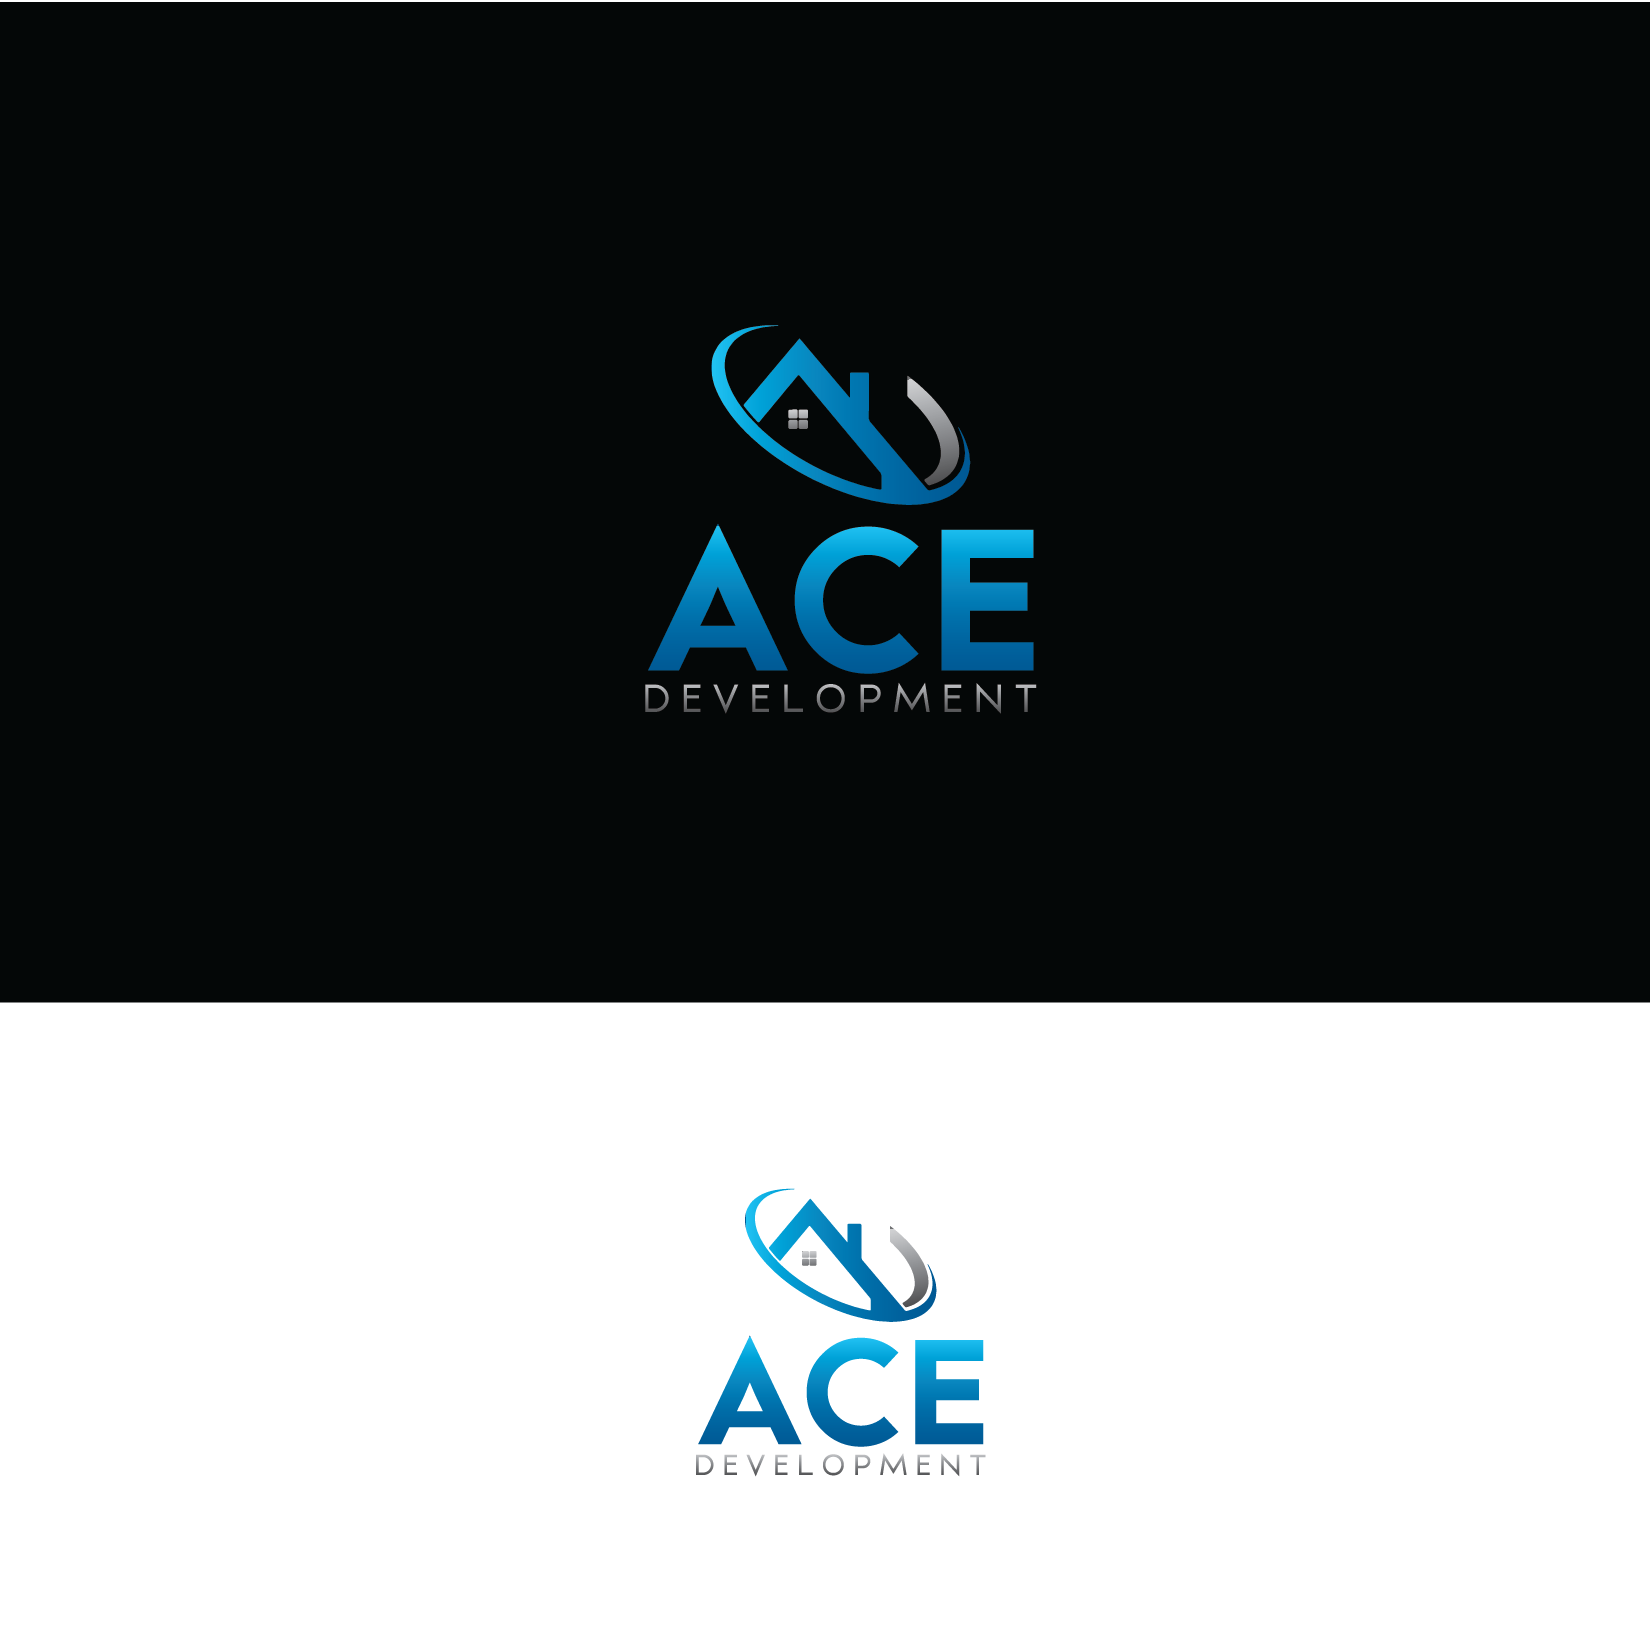 Logo Design by Private User - Entry No. 97 in the Logo Design Contest Fun Logo Design for Ace development.